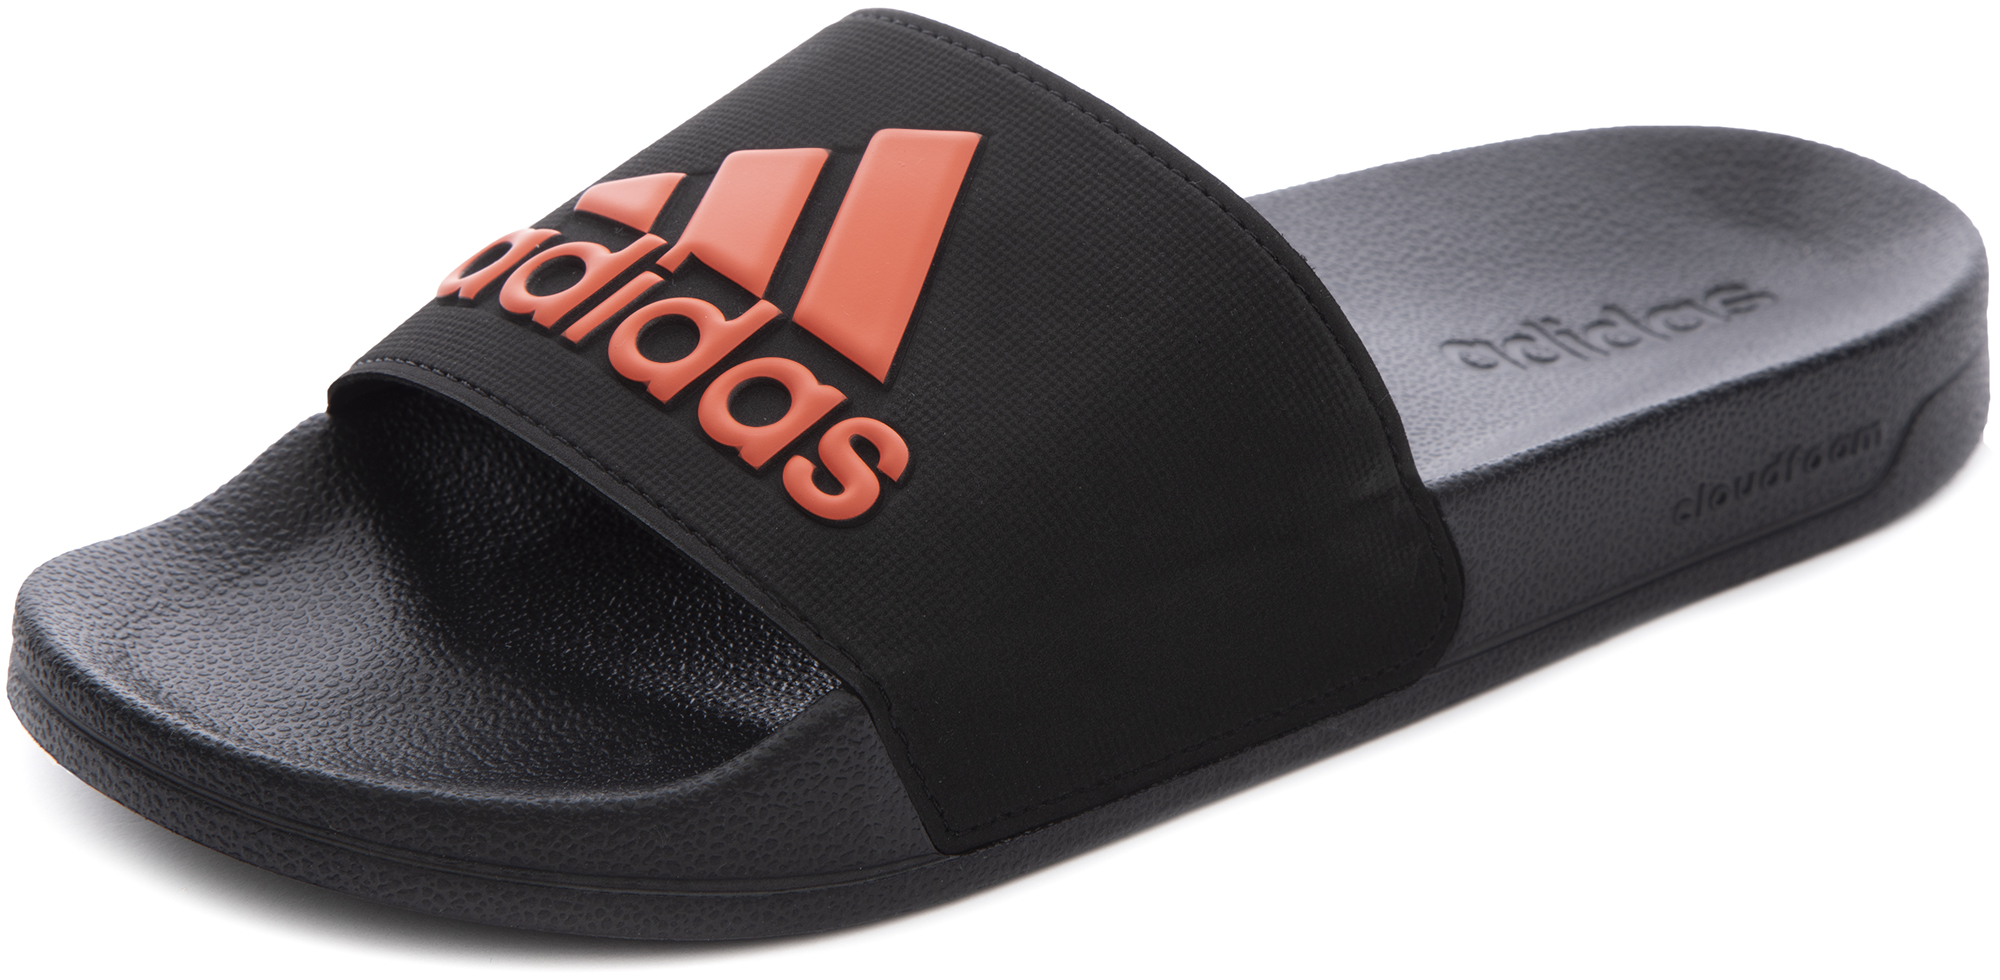 Adidas Шлепанцы мужские Adidas Adilette Shower, размер 46 шлепанцы мужские rider цвет синий белый 82499 20084 размер 47 46